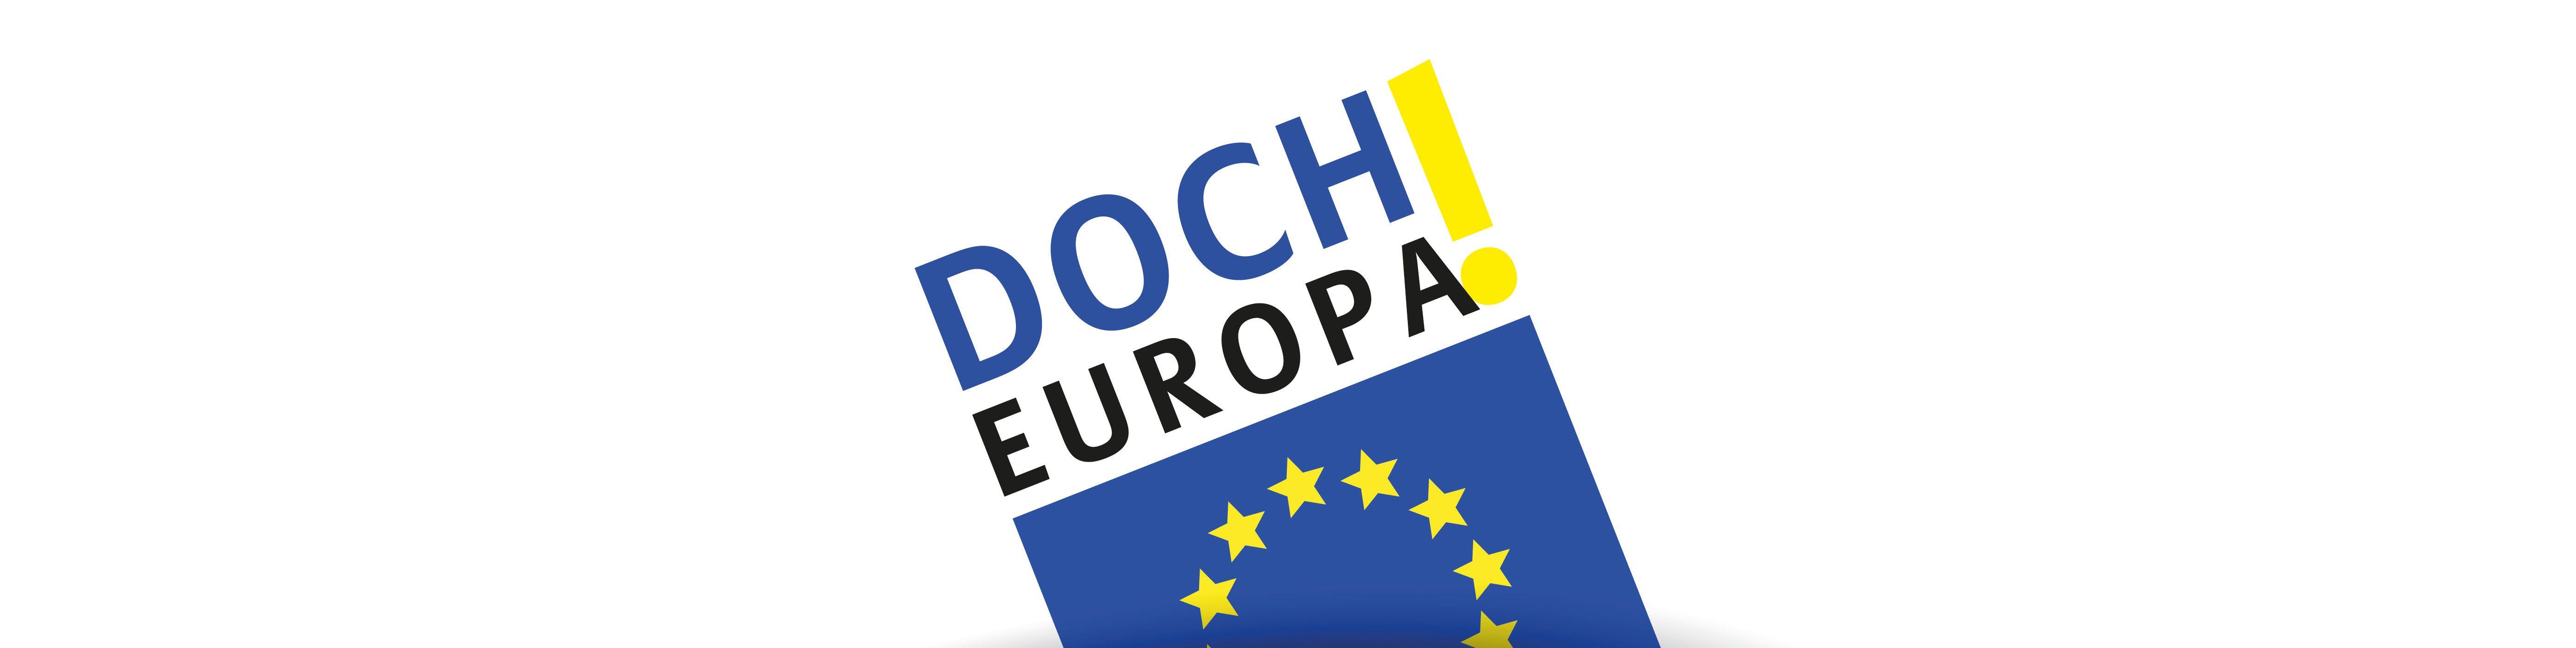 DochEuropa!